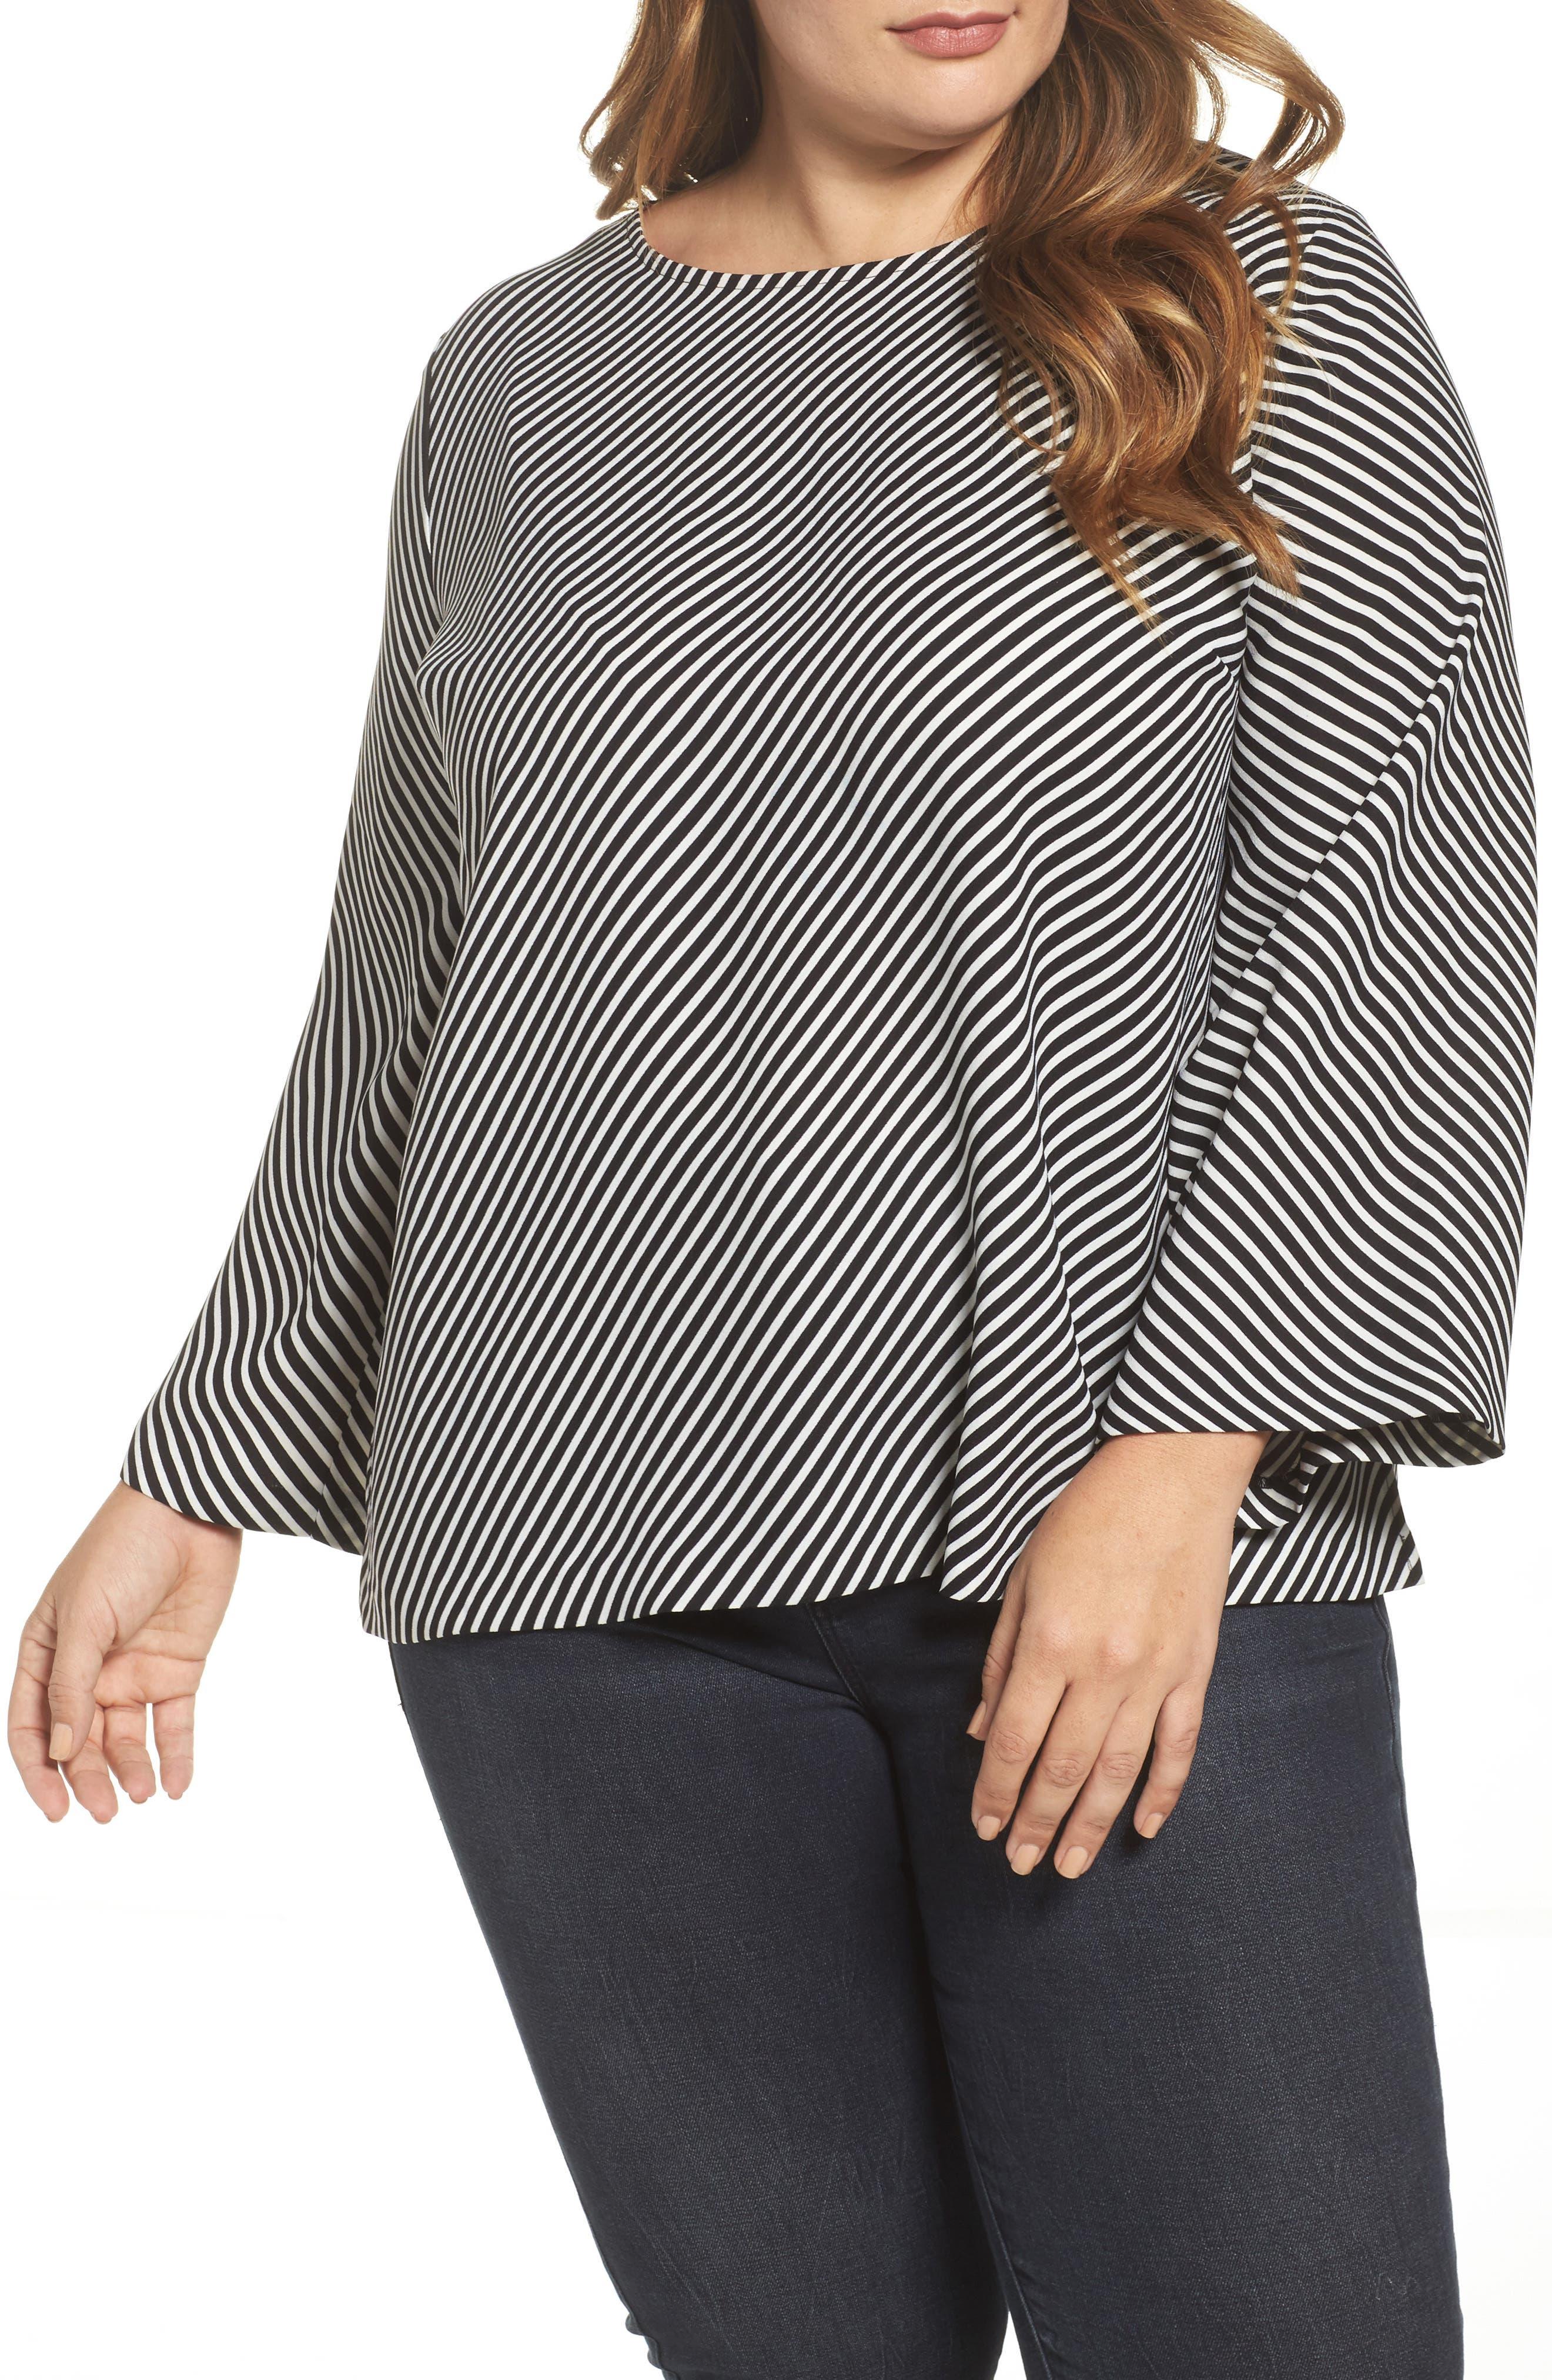 Bell Sleeve Diagonal Stripe Blouse,                             Main thumbnail 1, color,                             006